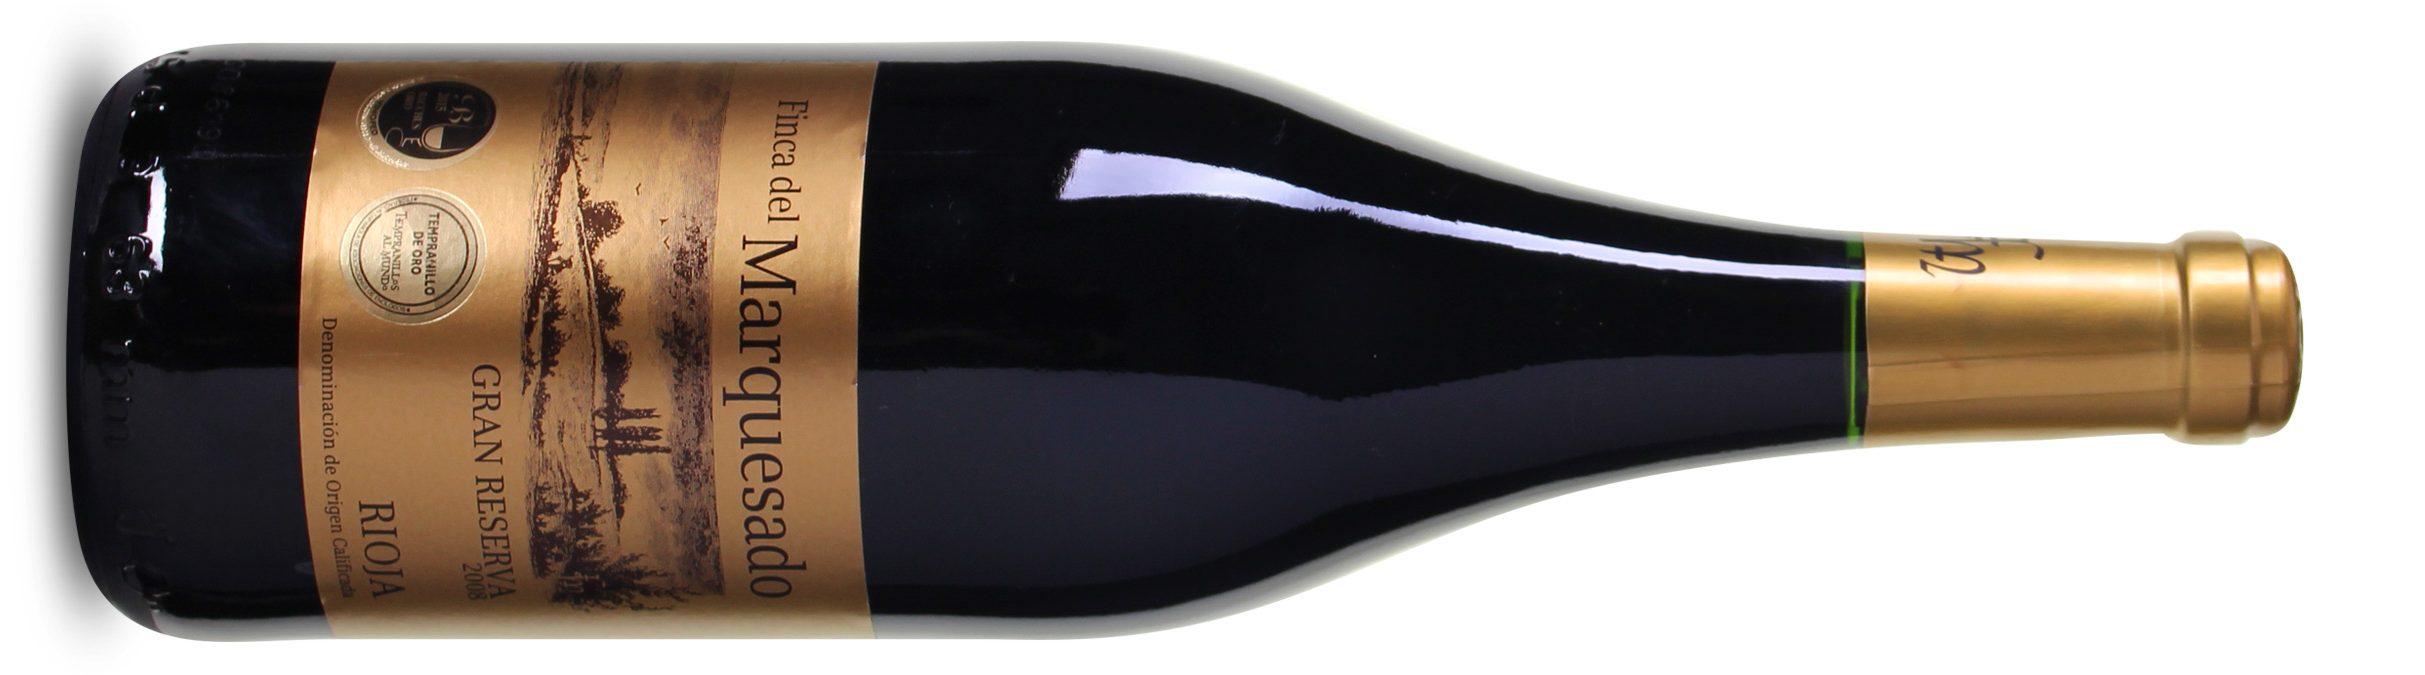 Finca del Marquesado Rioja Gran Reserva 2008